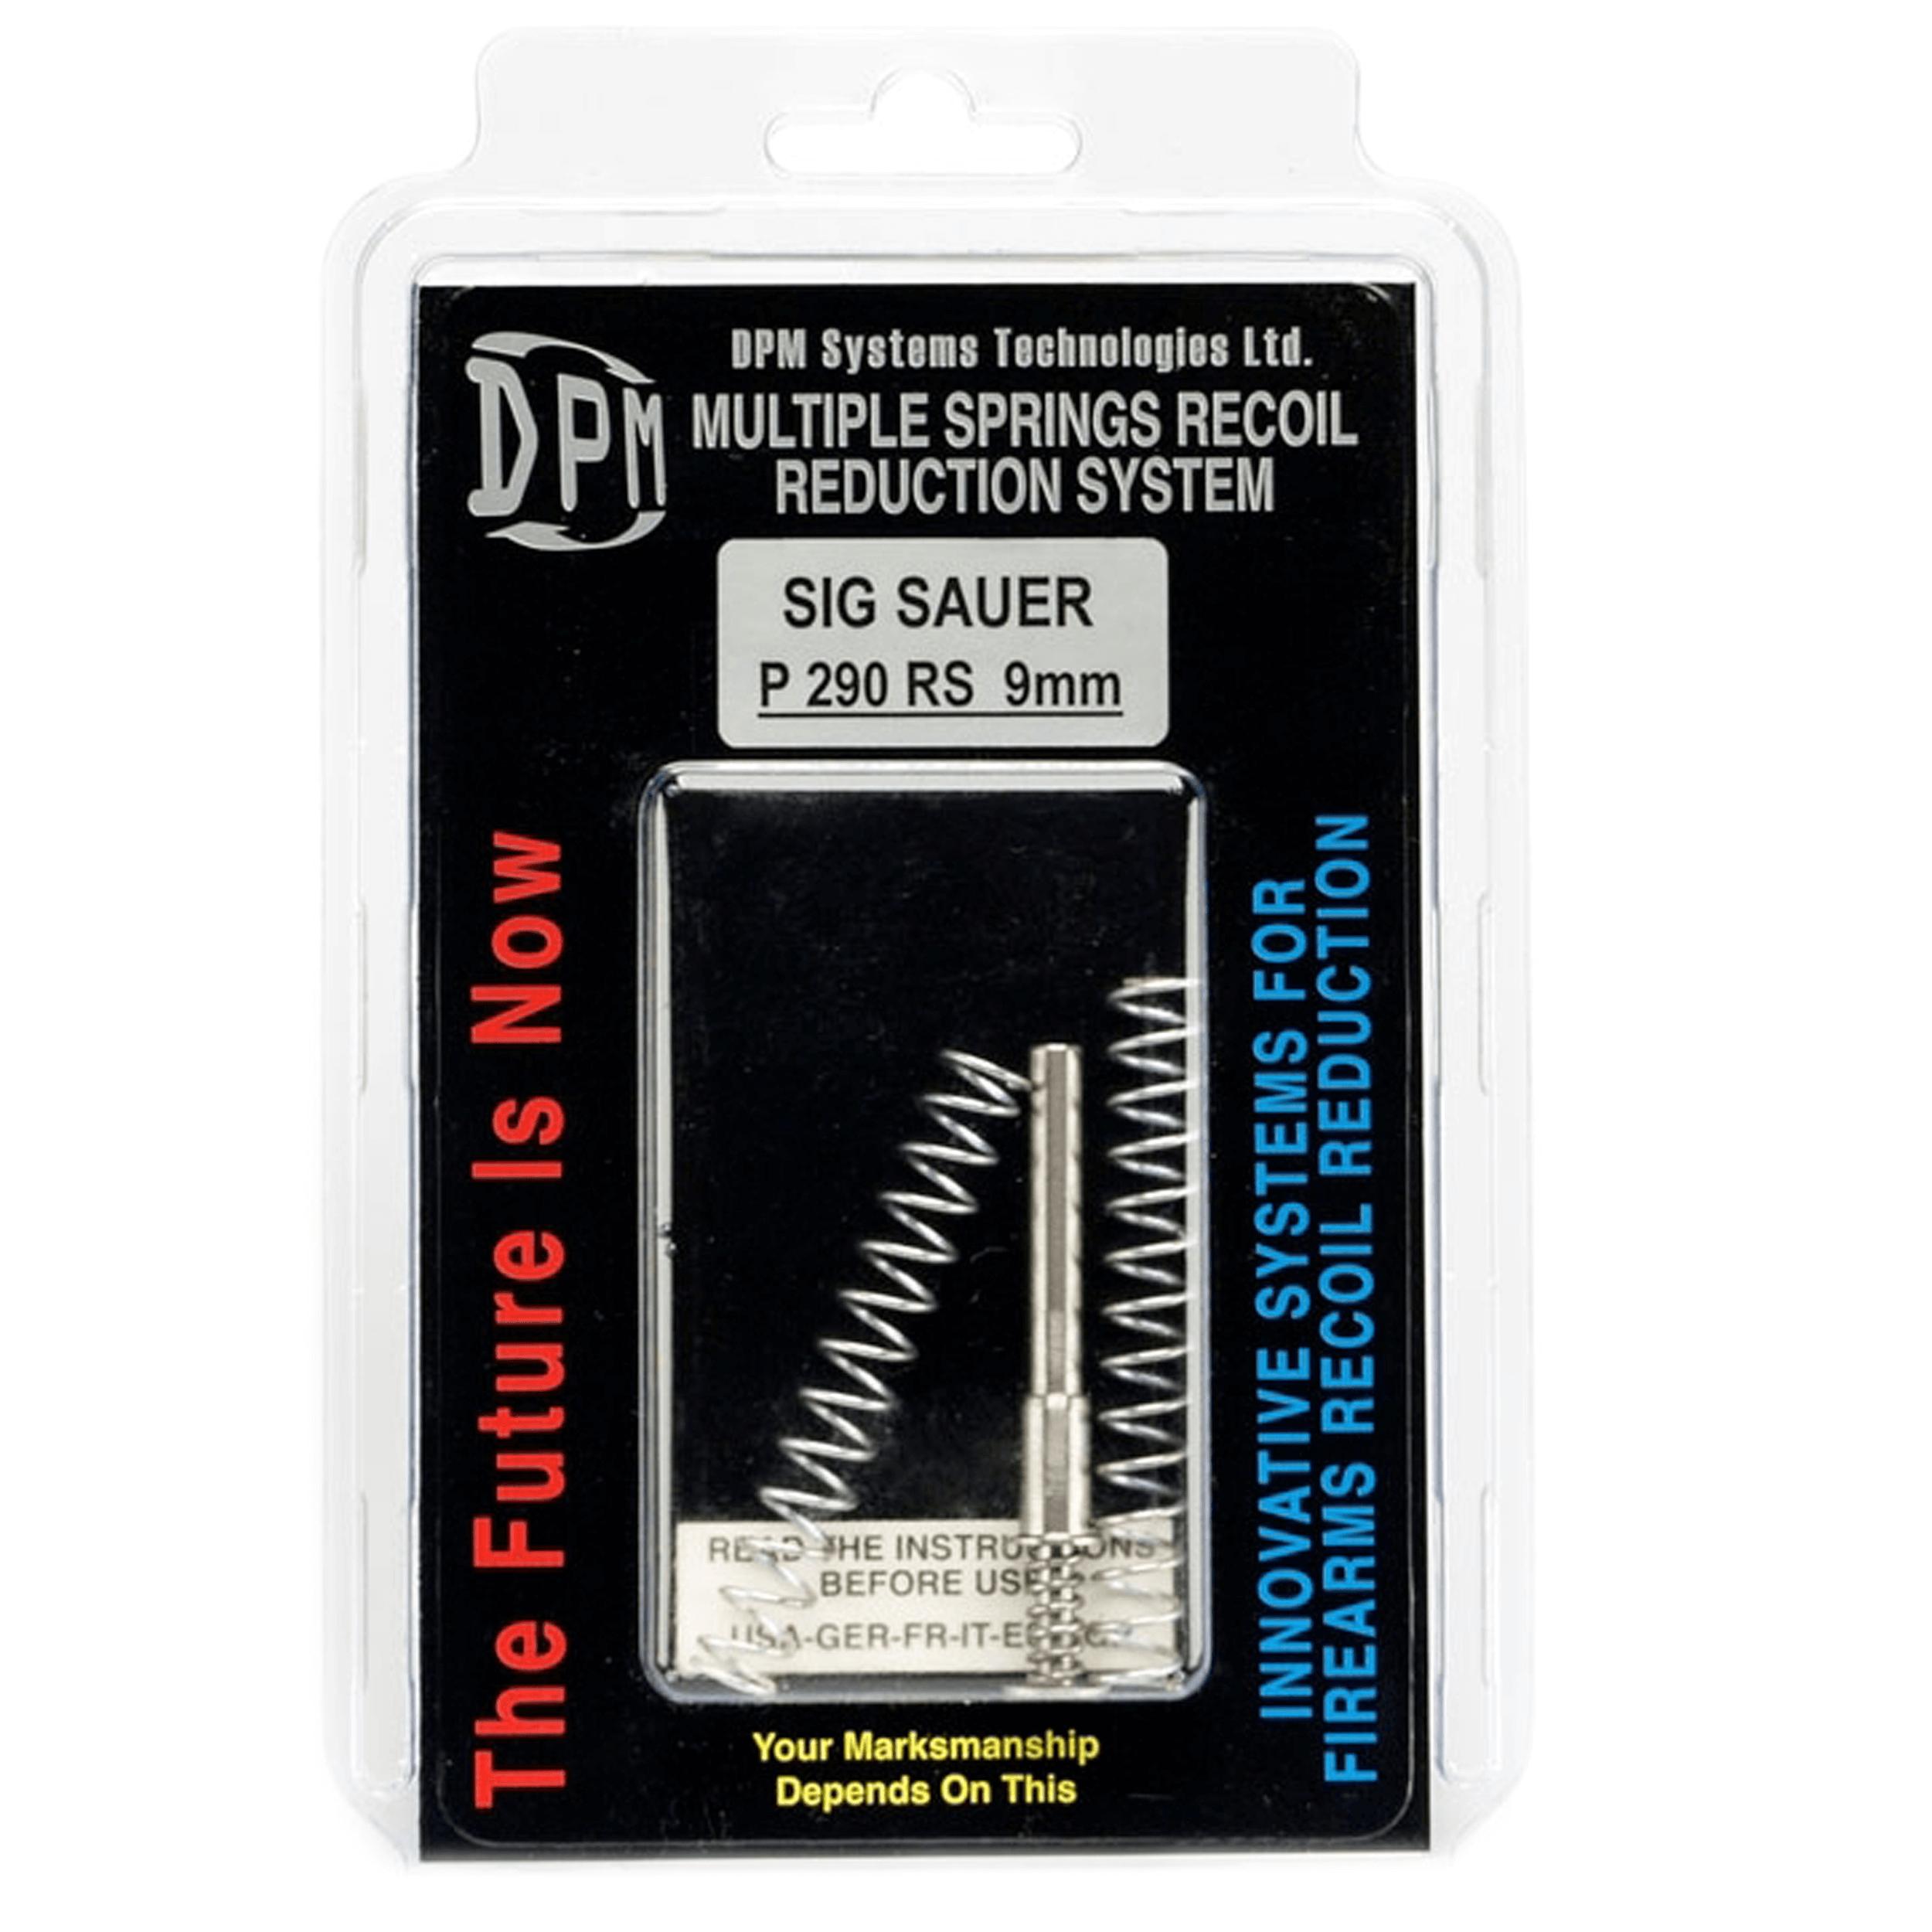 Sig Sauer P290 RS / 9mm